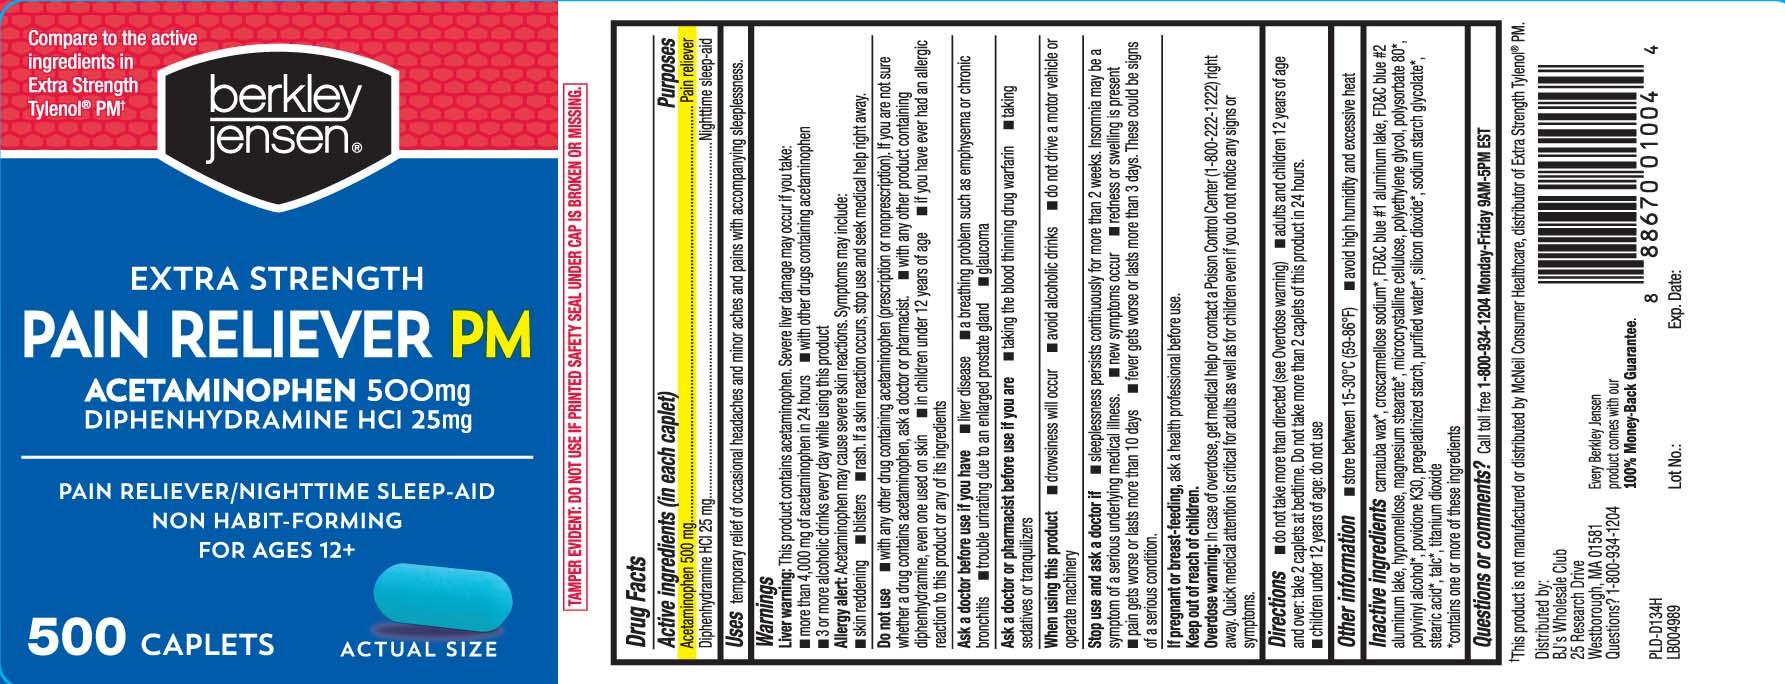 Acetaminophen 500 mg, Diphenhydramine HCI 25 mg